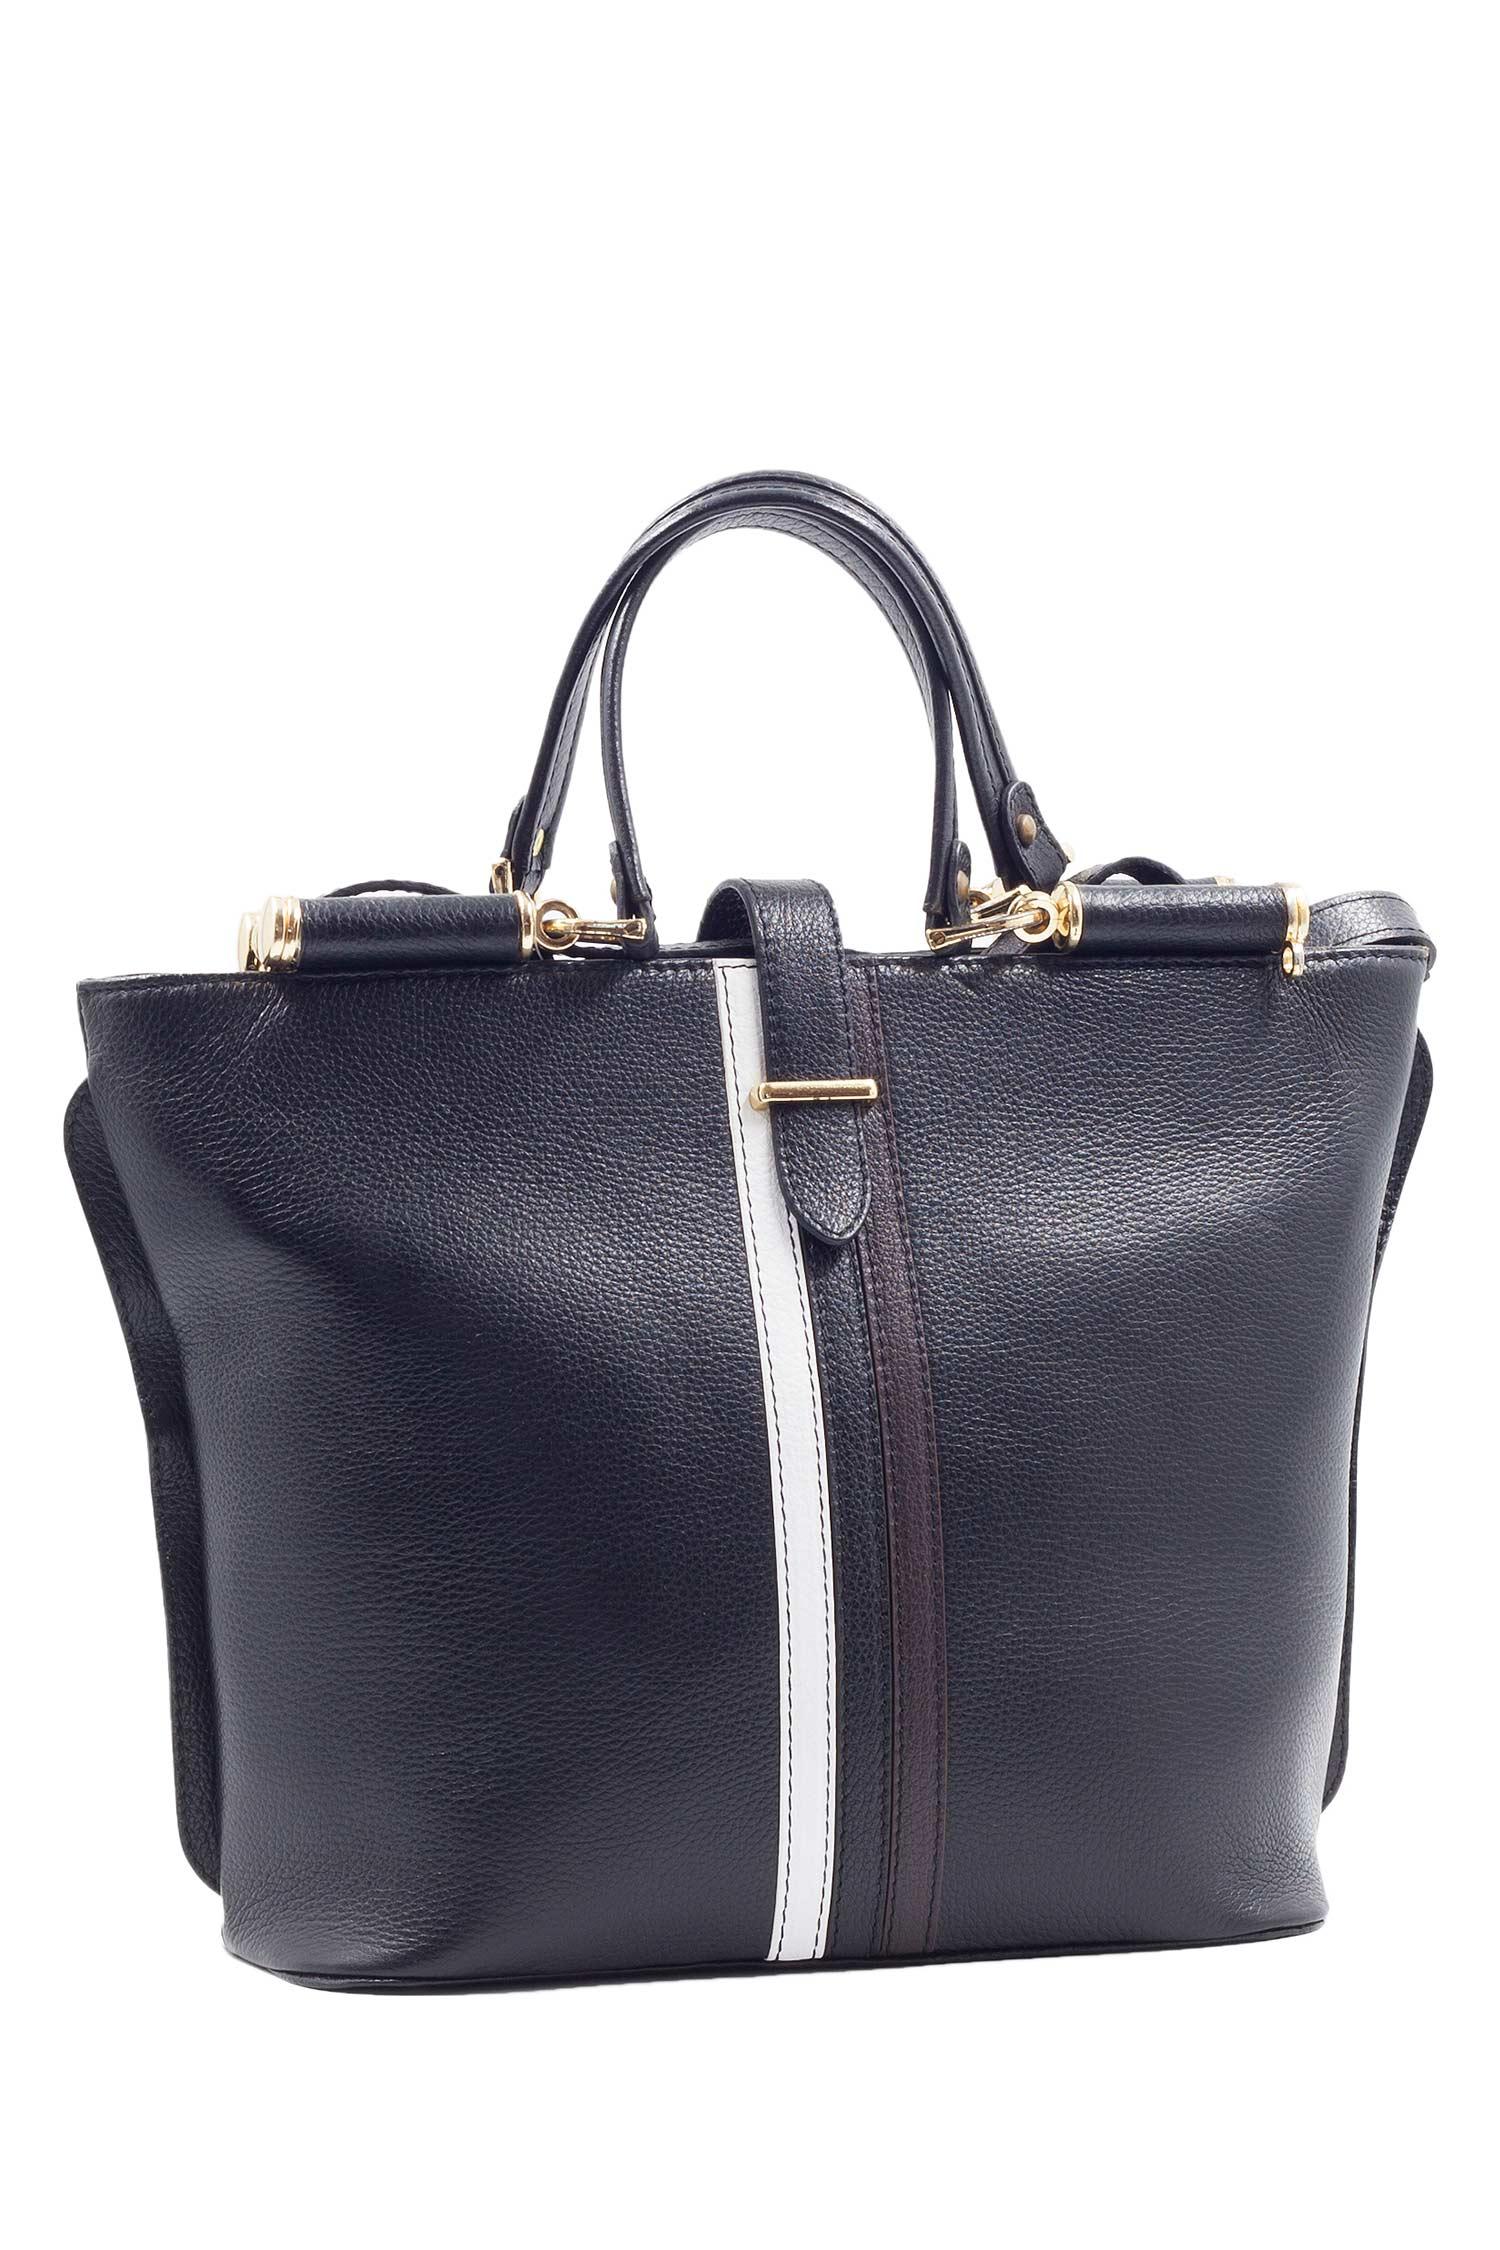 Creative Design 2017 Cheap Luxury Woman Handbag